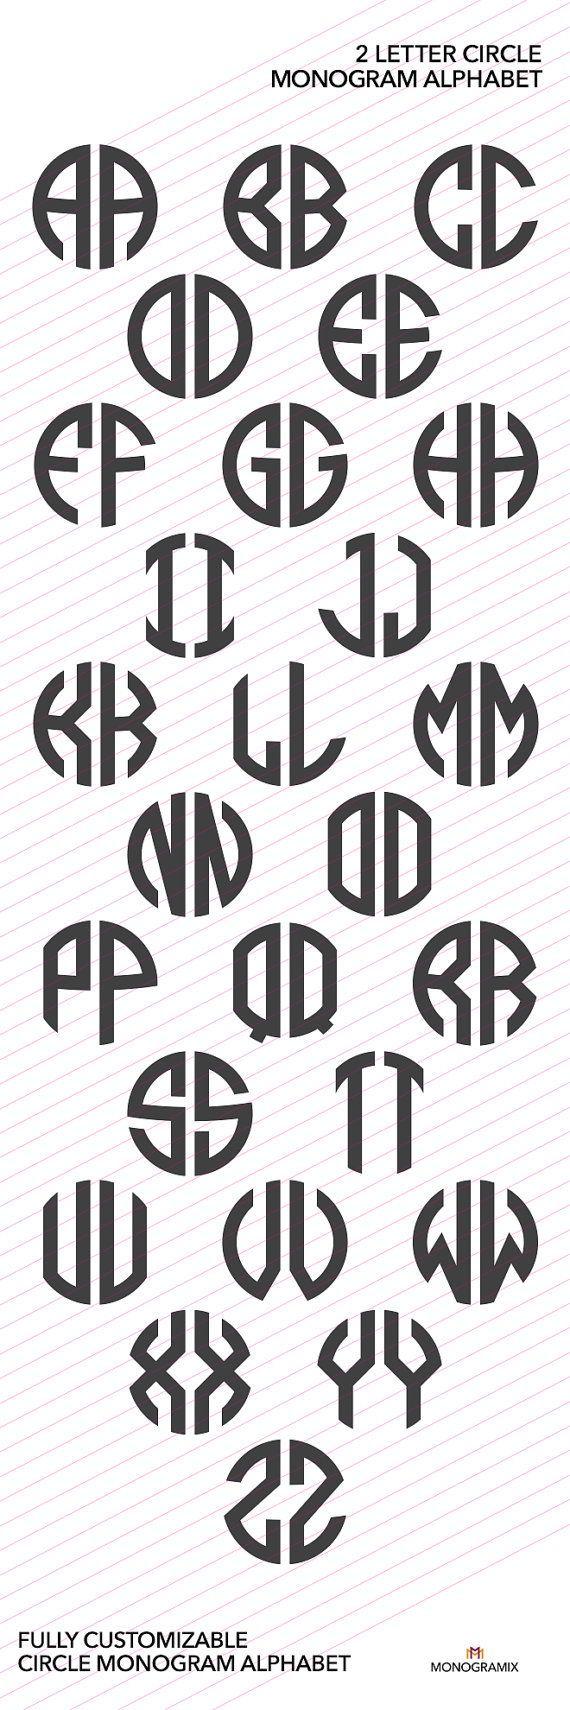 2 Brief Circle Monogramm Alphabet Ai Eps Svg Dxf Studio Ai Alphabet Circle Dxf Eps Logo Monogramm Studio Monogram Alphabet Lettering Lettering Fonts